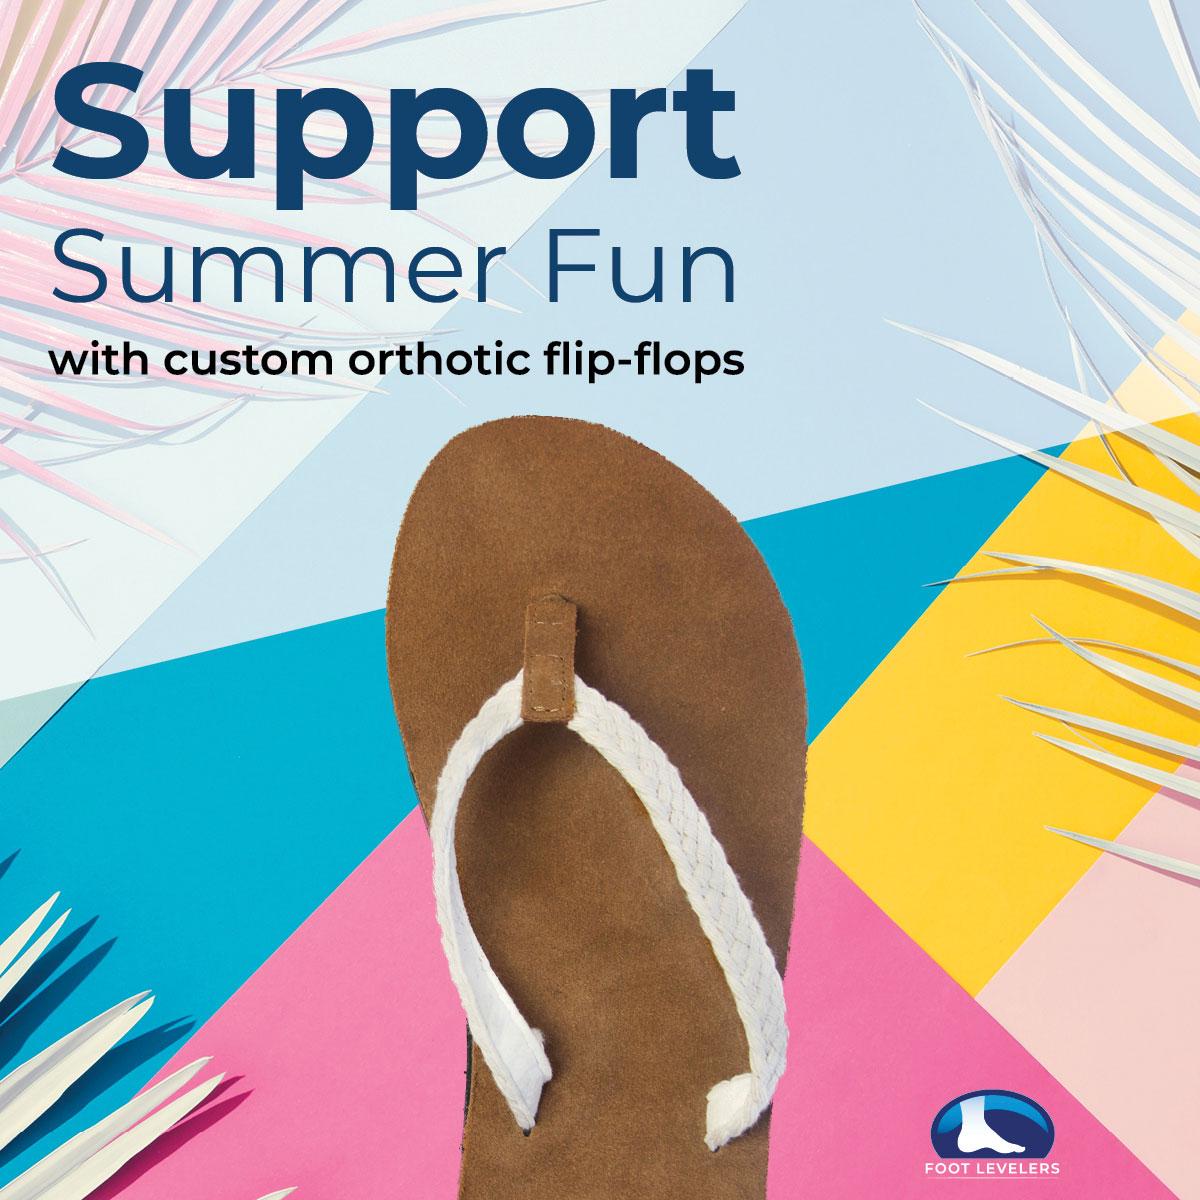 Custom orthotic flip-flops